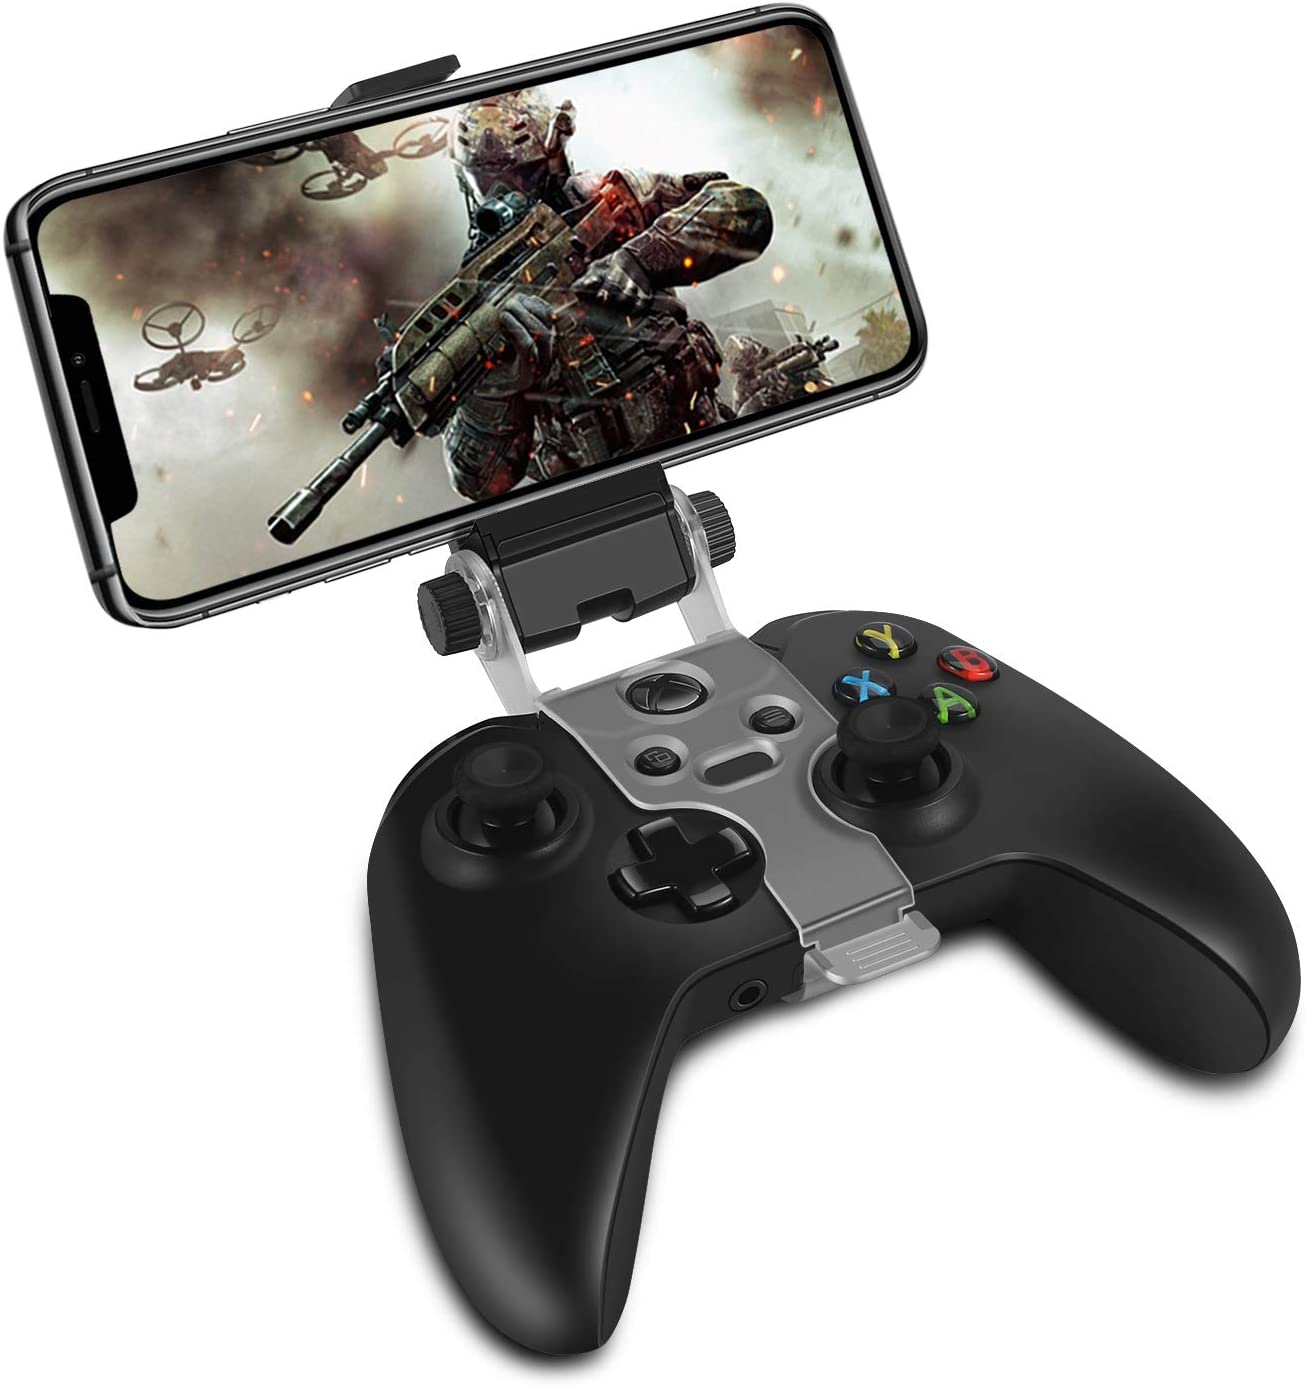 TNP Soporte de clip para Celular Compatible con Controlador Inalámbrico Xbox One S X, Soporte Plegable para iPhone 11 Pro Max, 11 Pro, 11, Xs Max, Xs, X, 8 Plus, 7,Android Samsung LG Xbox Accessories